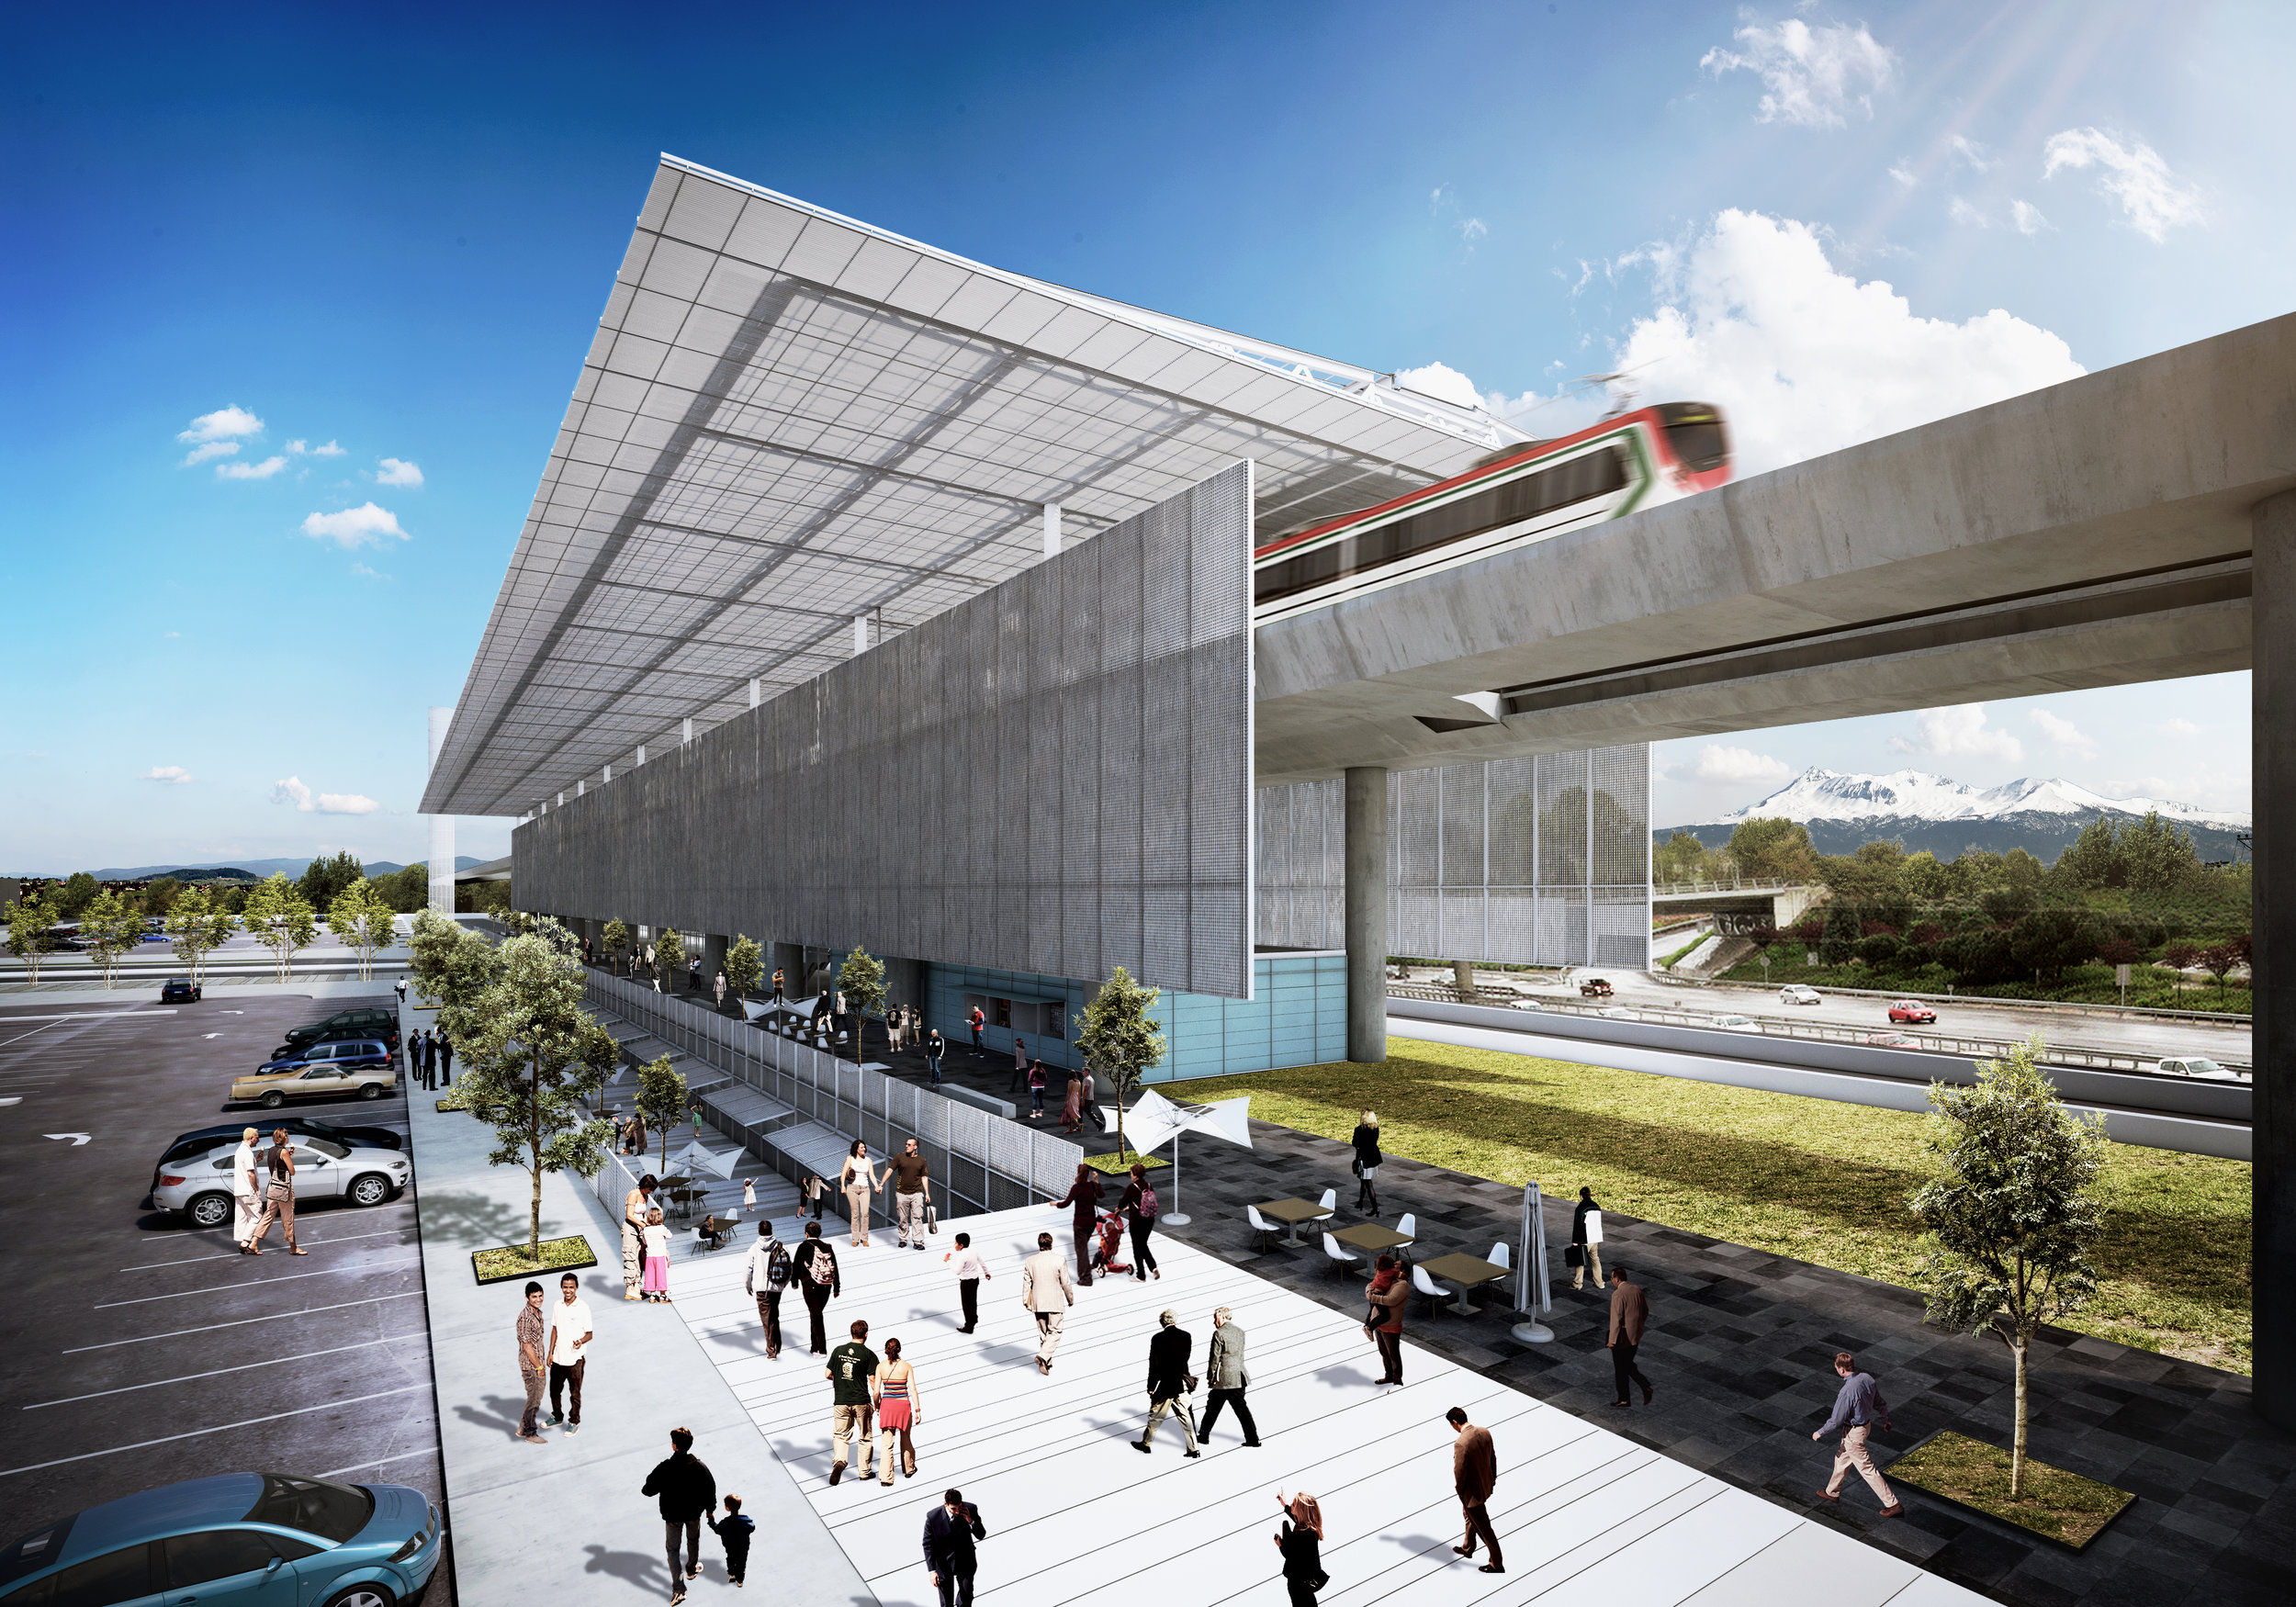 Tren Interurbano / Estación Zinacantepec - Estado de México